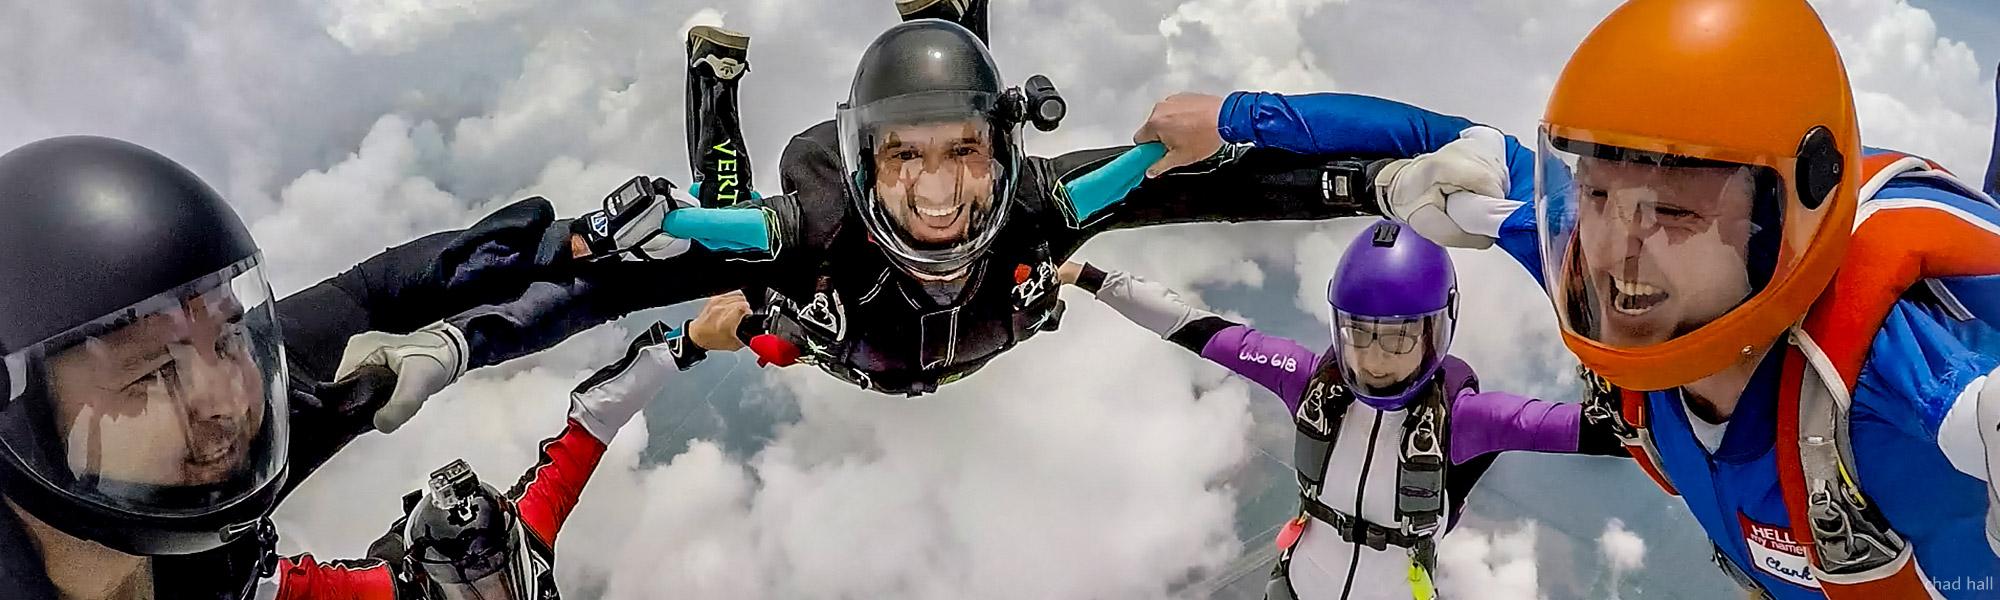 Skydiving Organizers